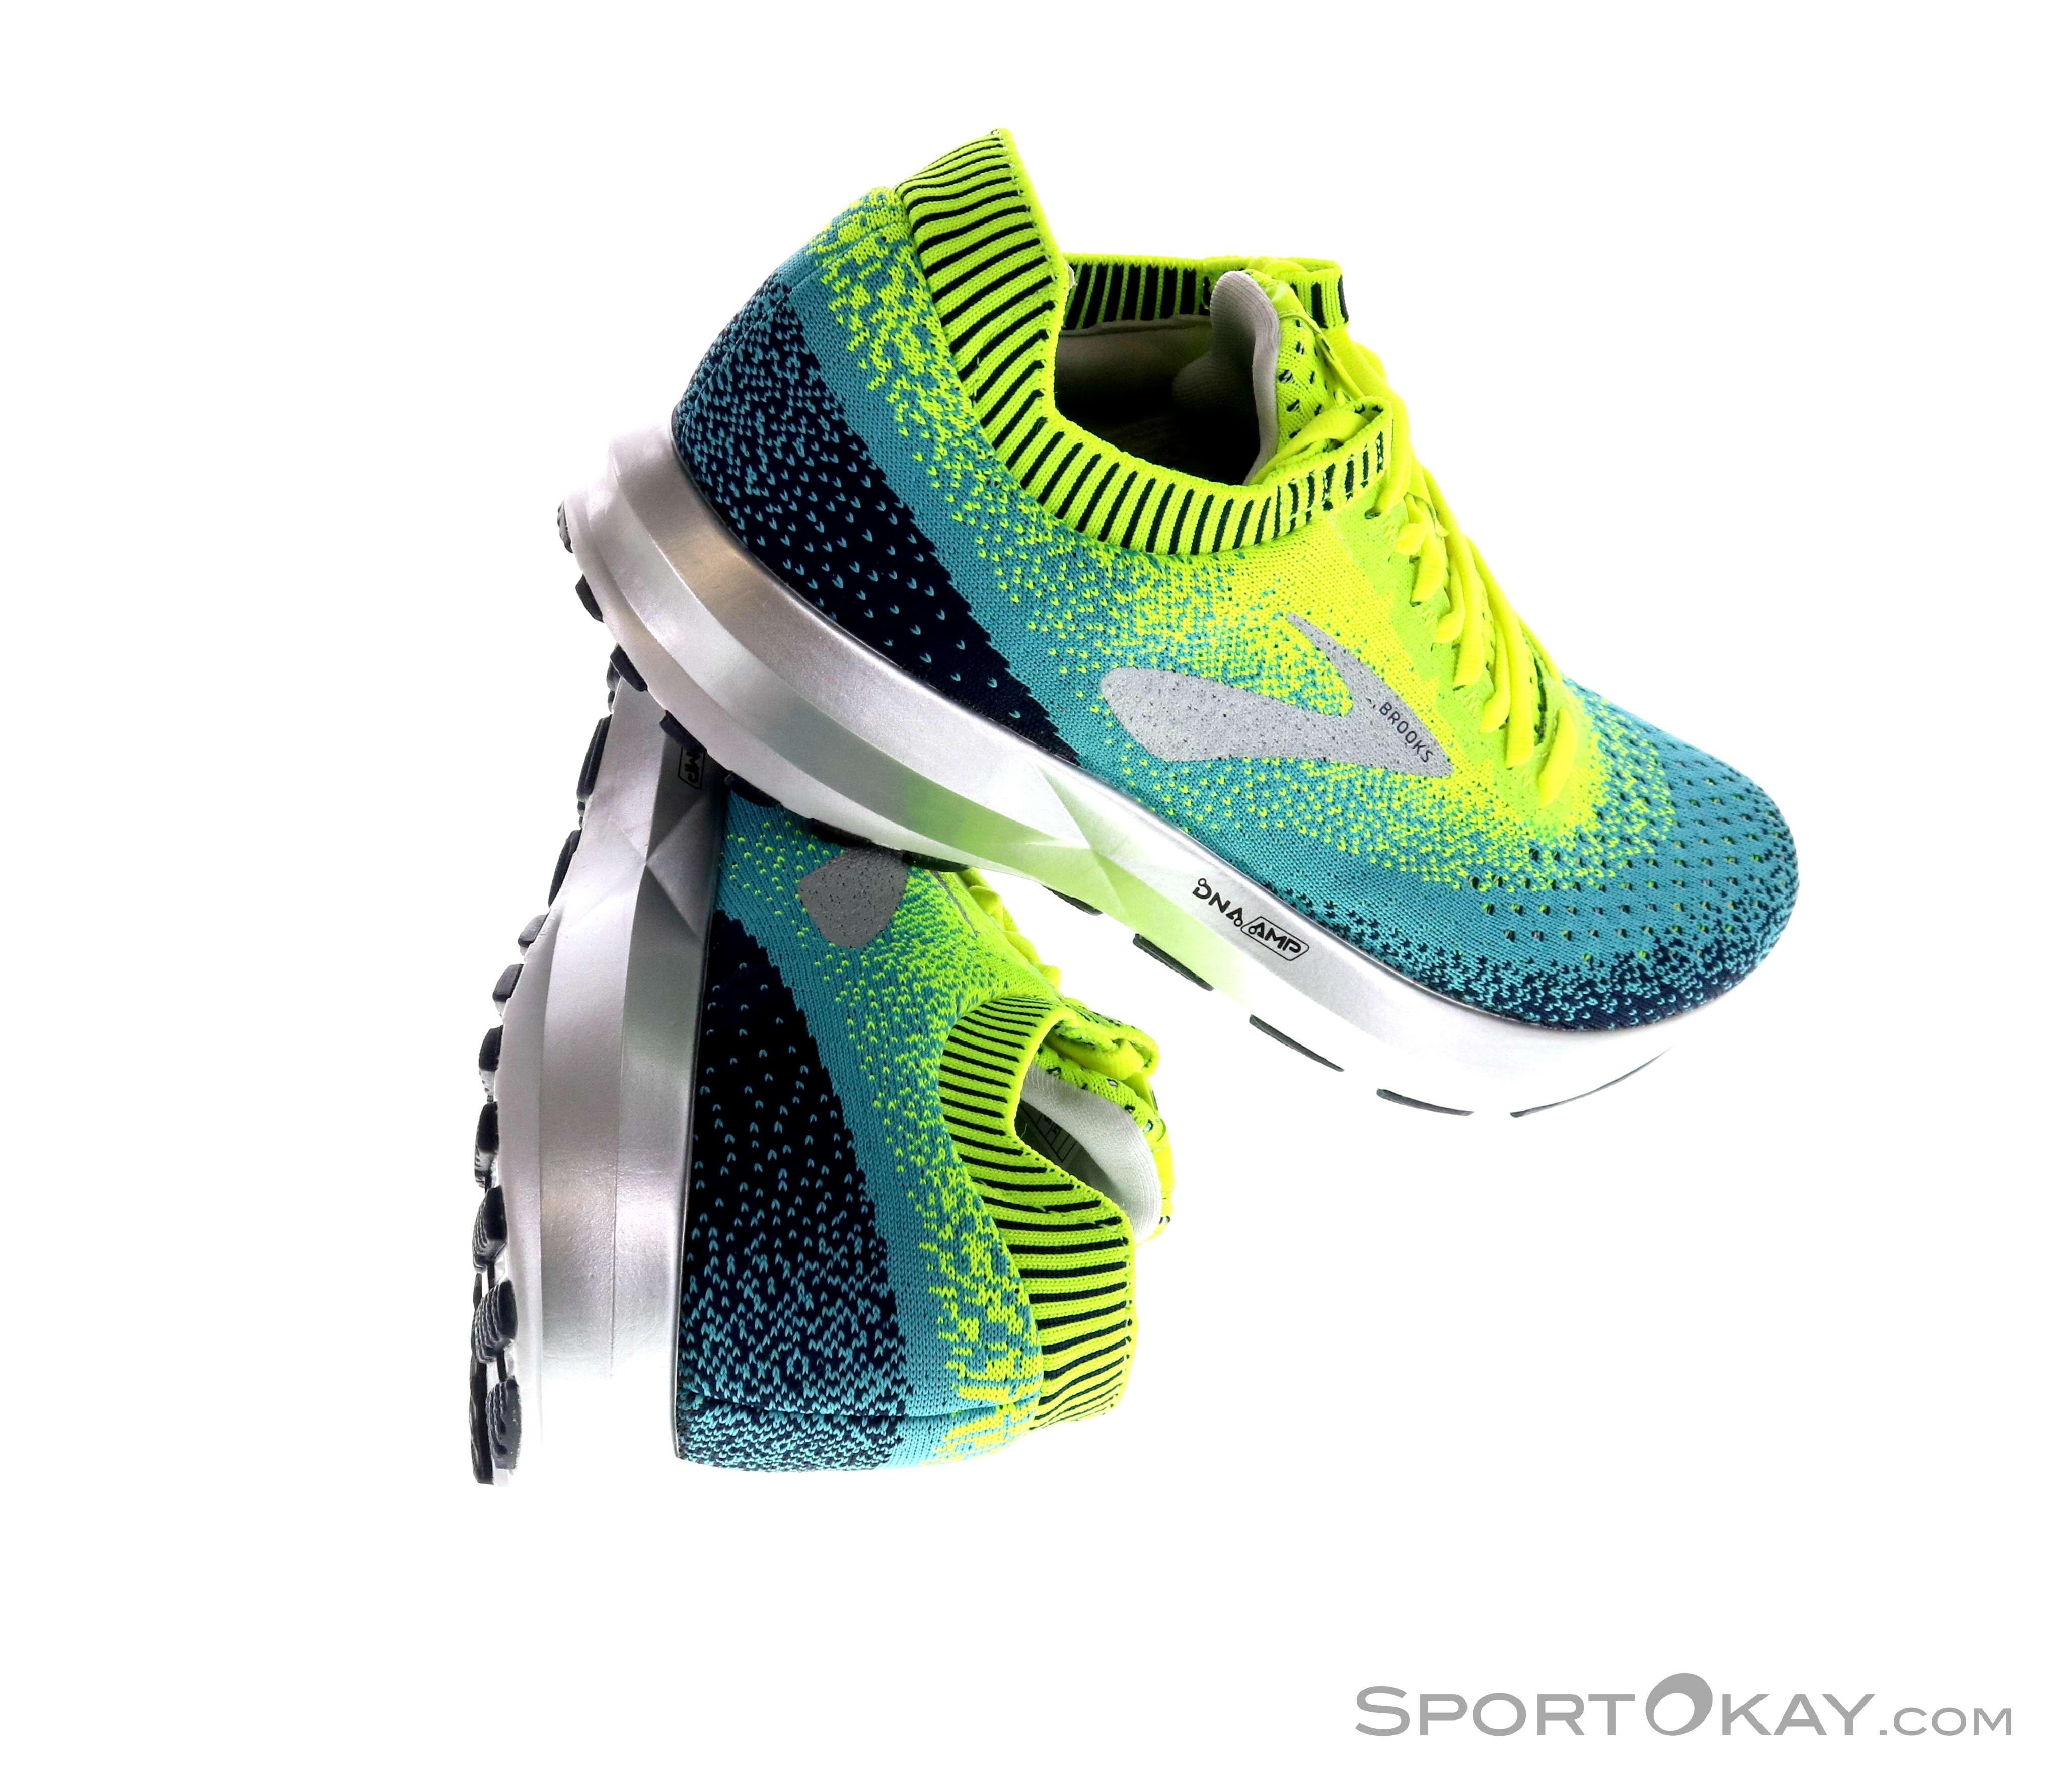 e03bcd9f3c7 Brooks Levitate 2 Womens Running Shoes - Running Shoes - Running ...